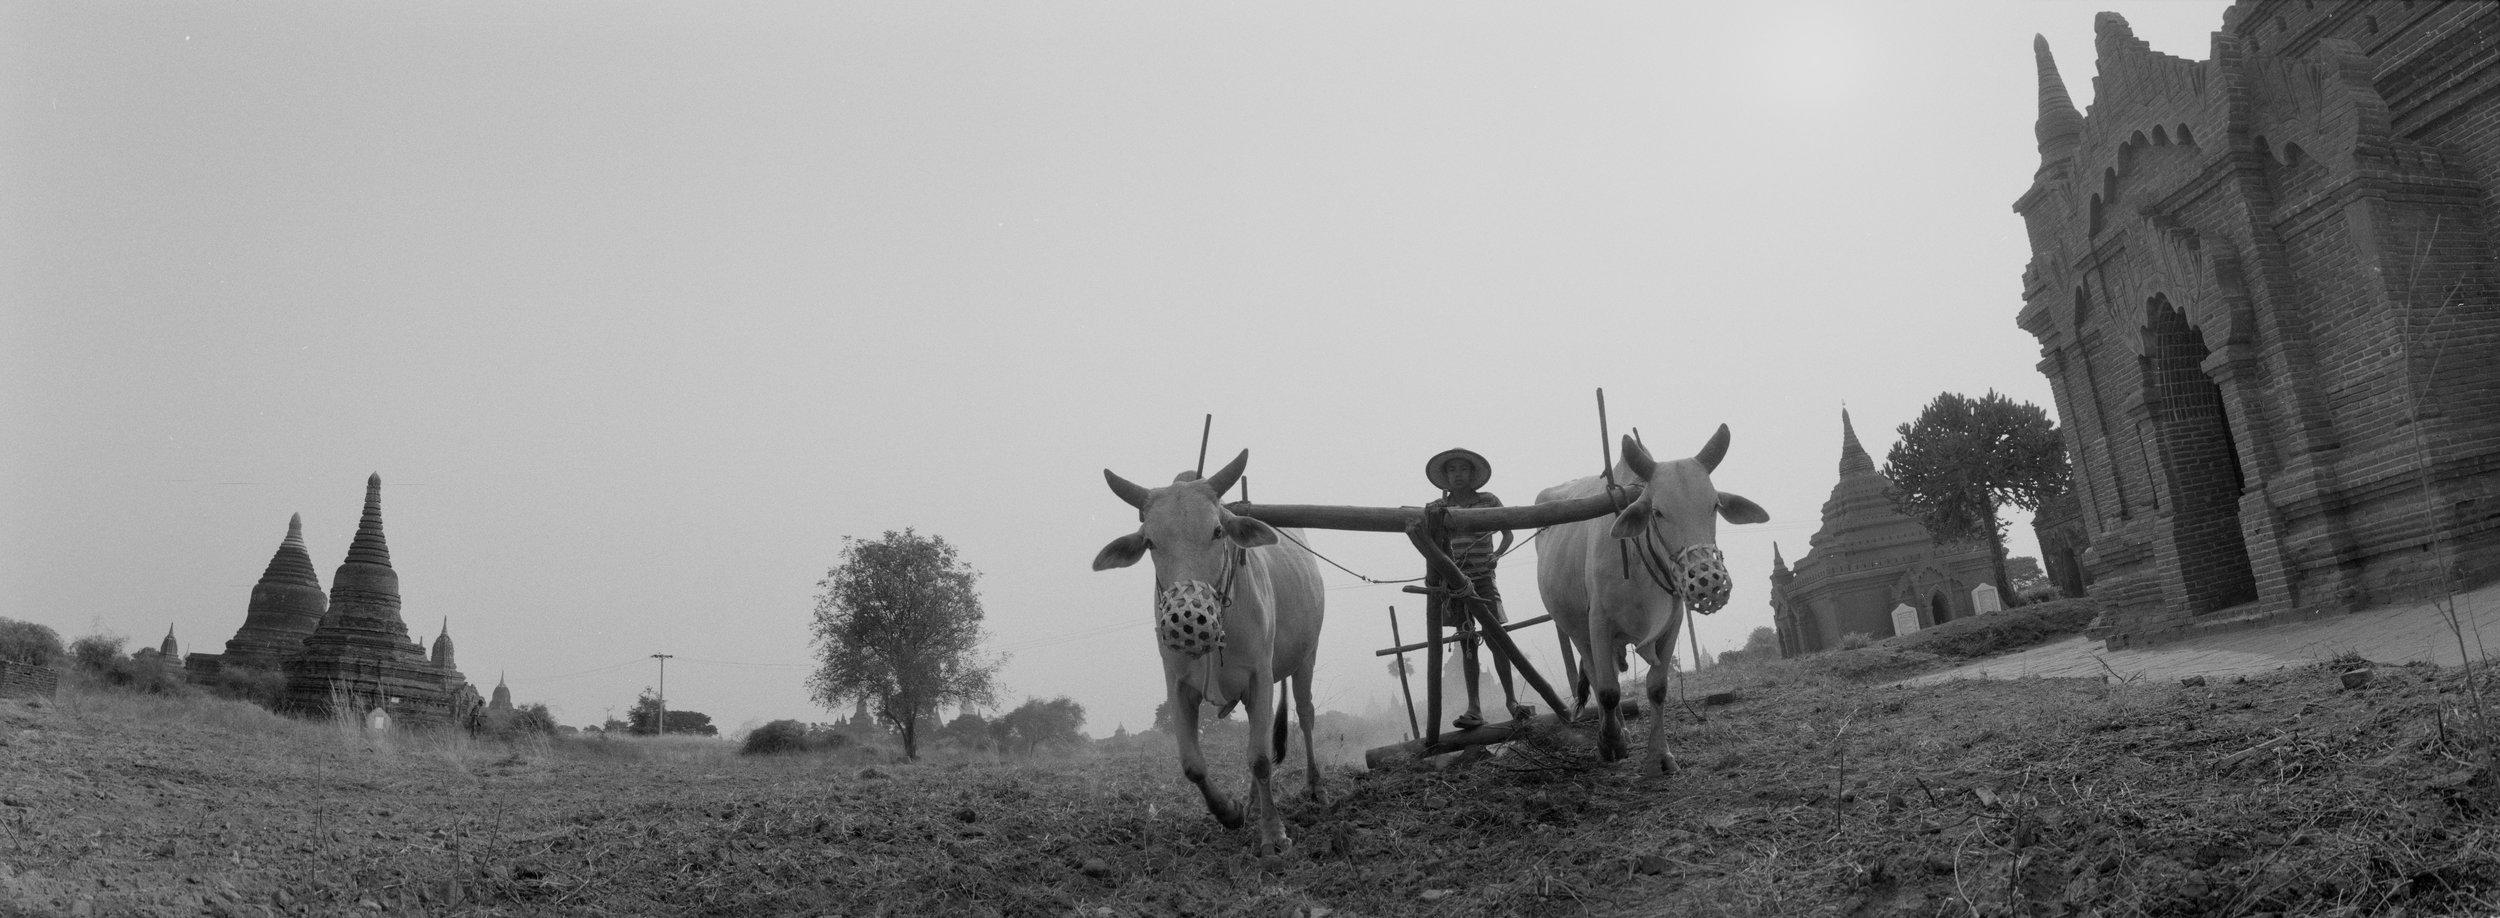 Pagan, Burma 2003